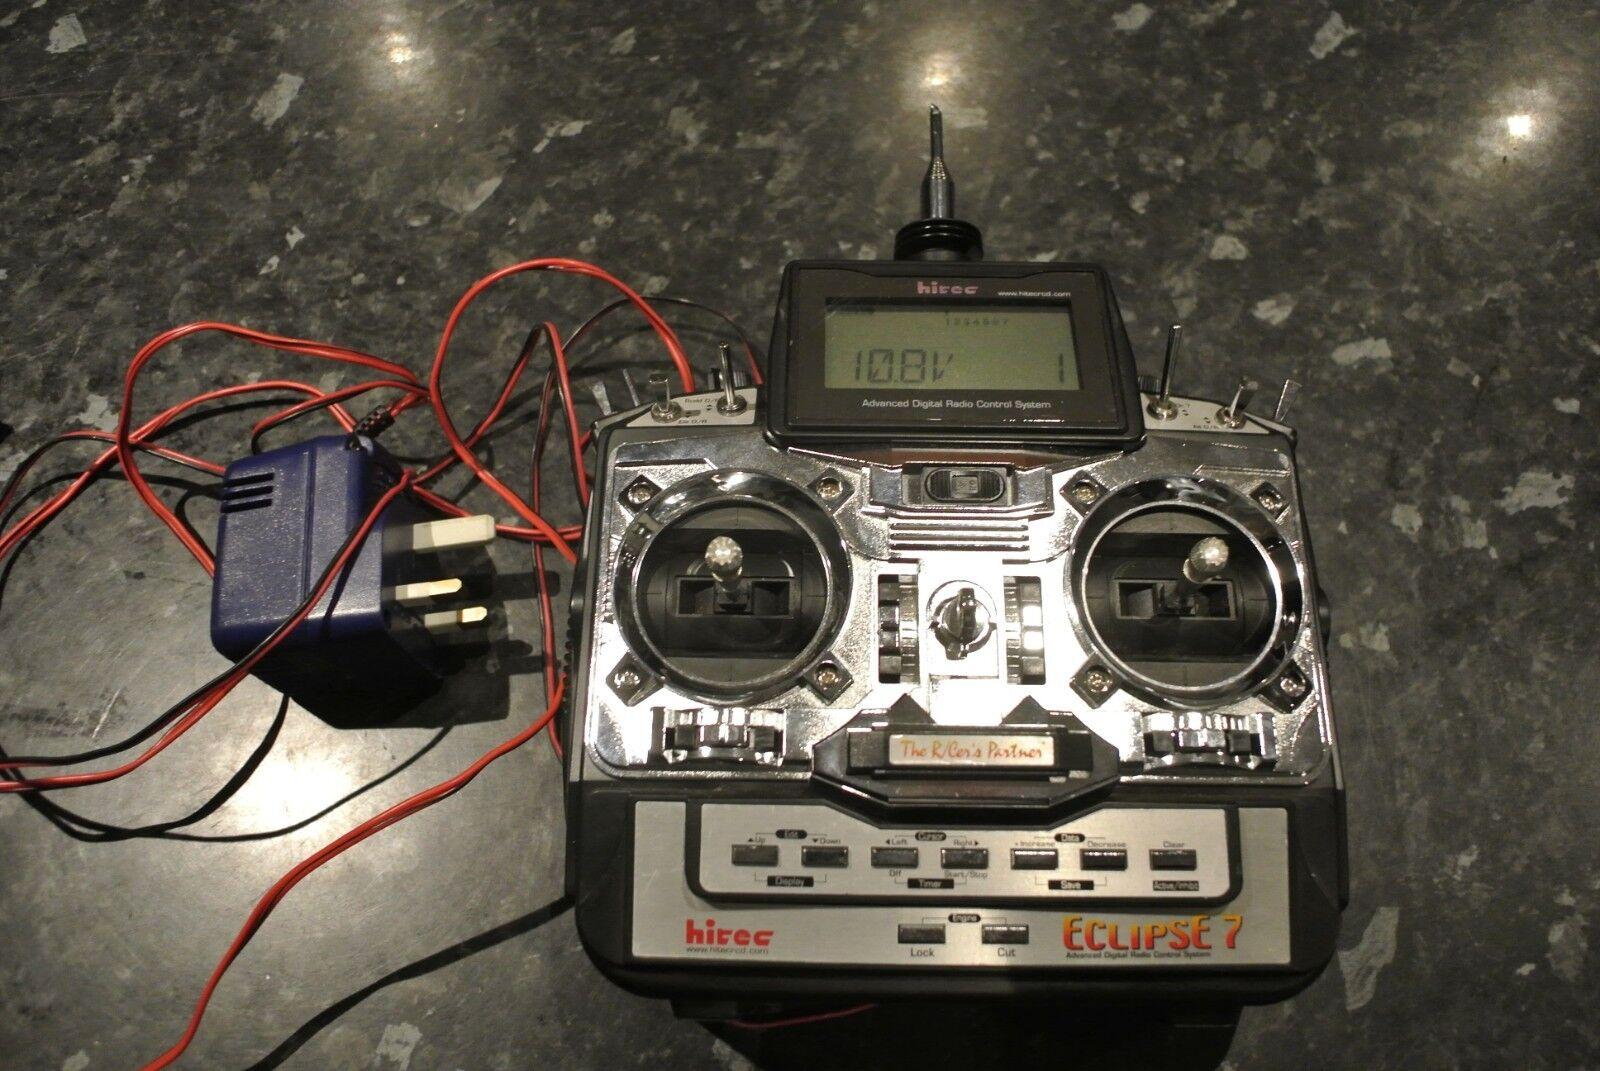 Klassisk FM HITEC Hi-Tec ECLIPSE 7 RC Radio Transmitter 7 Channel Heli, Aero etc.